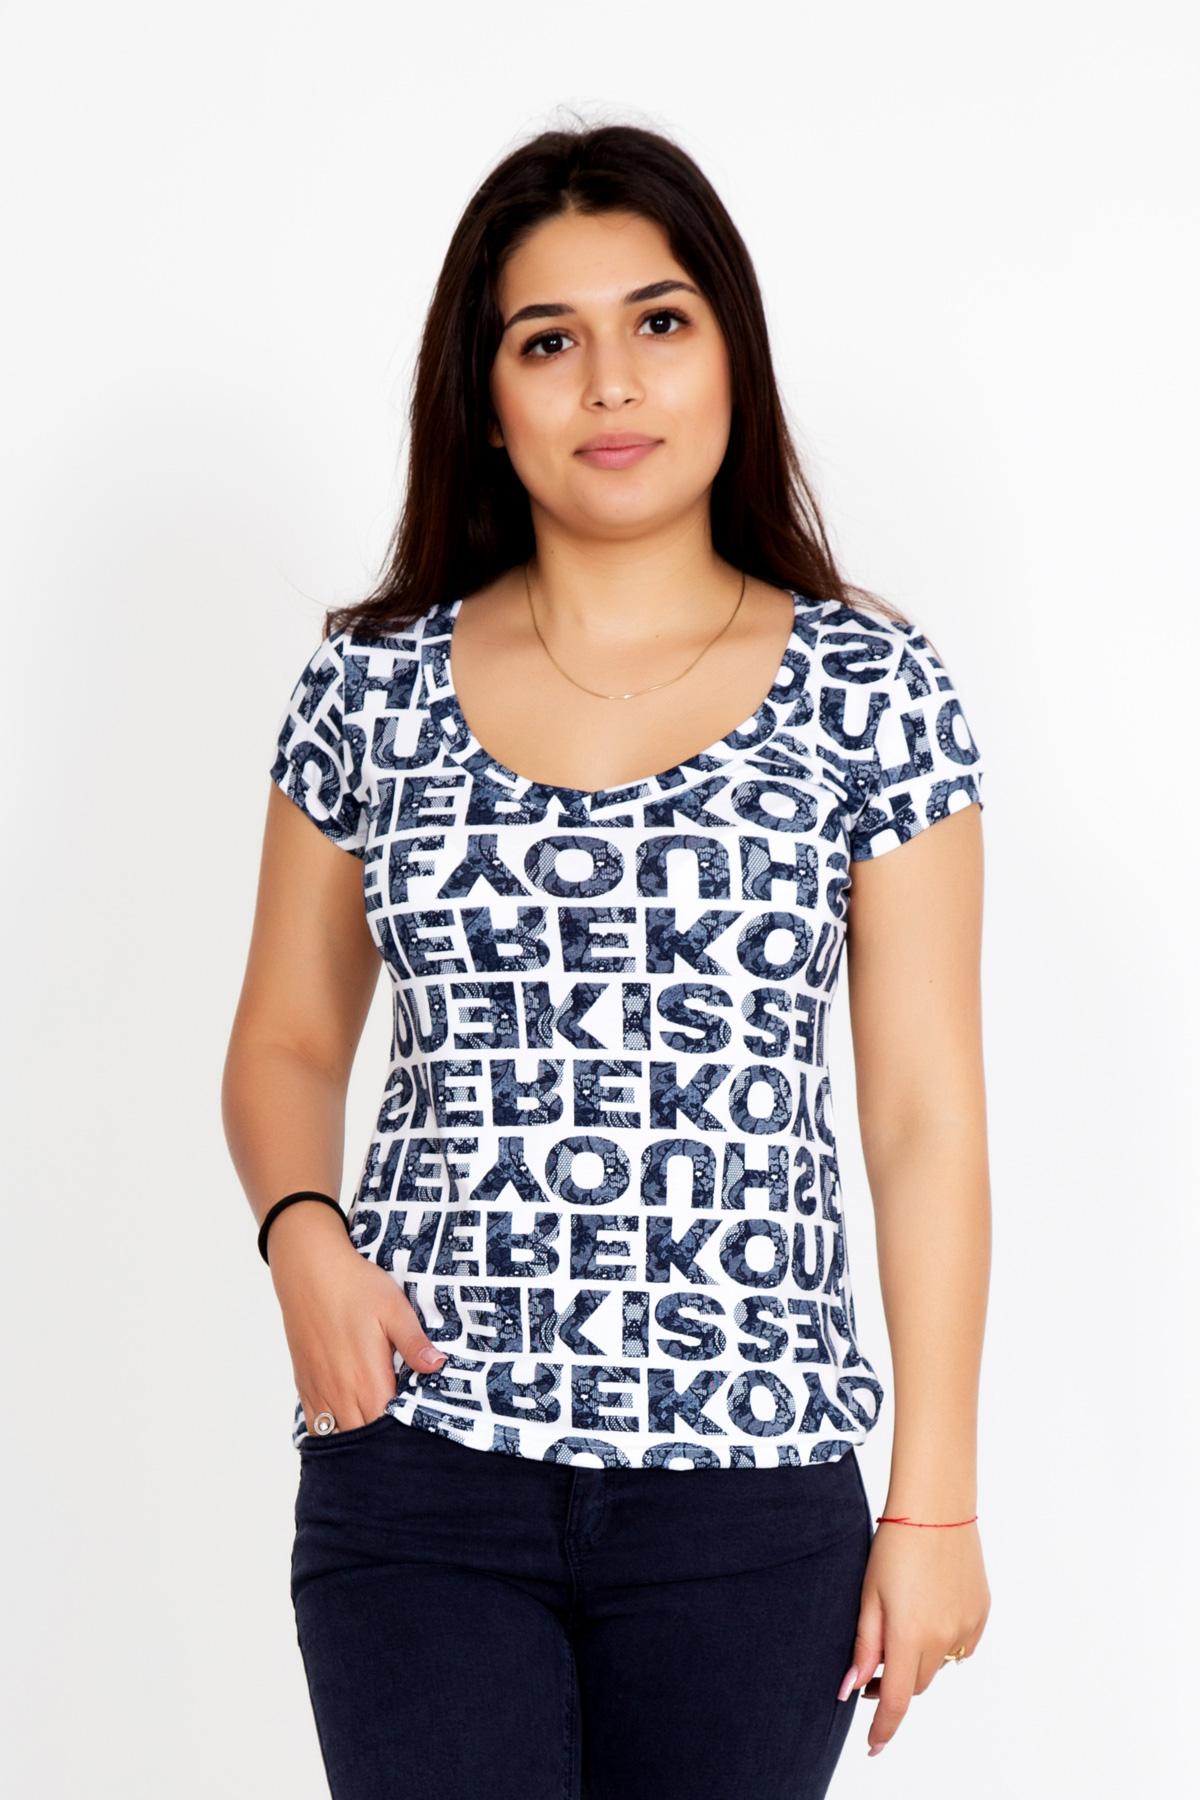 Жен. футболка Лиза р. 58Майки и футболки<br>Факт. ОГ: 108 см <br>Факт. ОТ: 102 см <br>Факт. ОБ: 112 см <br>Длина по спинке: 65 см<br><br>Тип: Жен. футболка<br>Размер: 58<br>Материал: Фулайкра